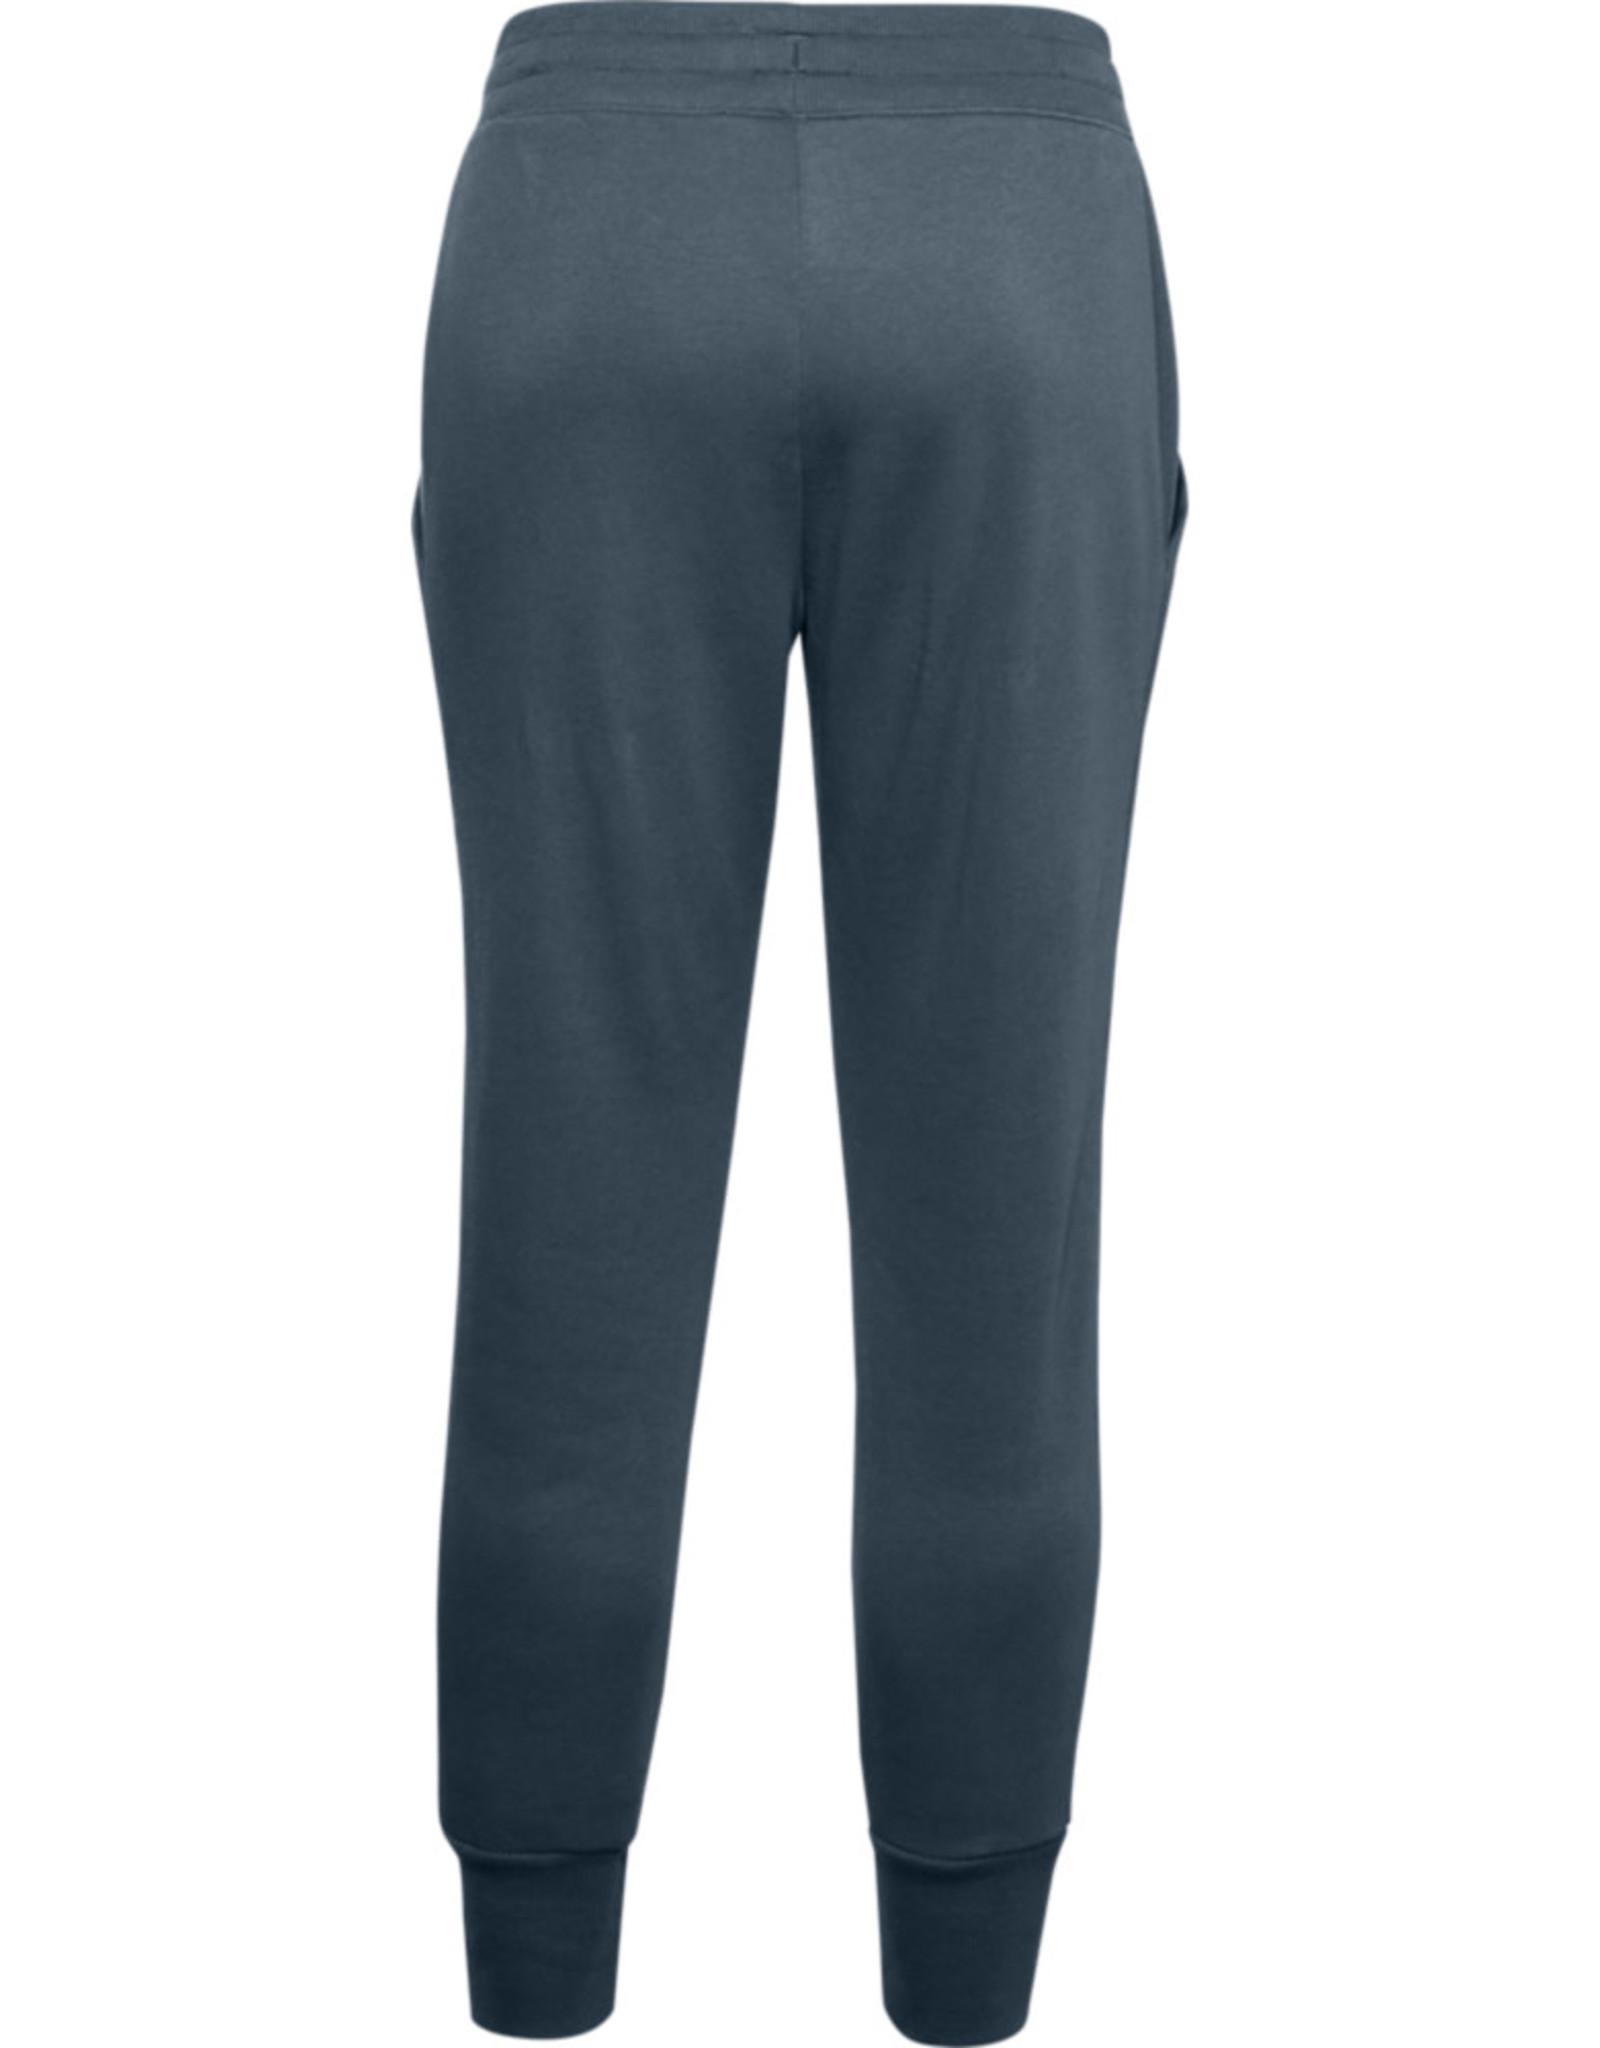 Under Armour UA Rival Fleece EMB Pant - Mechanic Blue-Mechanic Blue-Metallic Silver